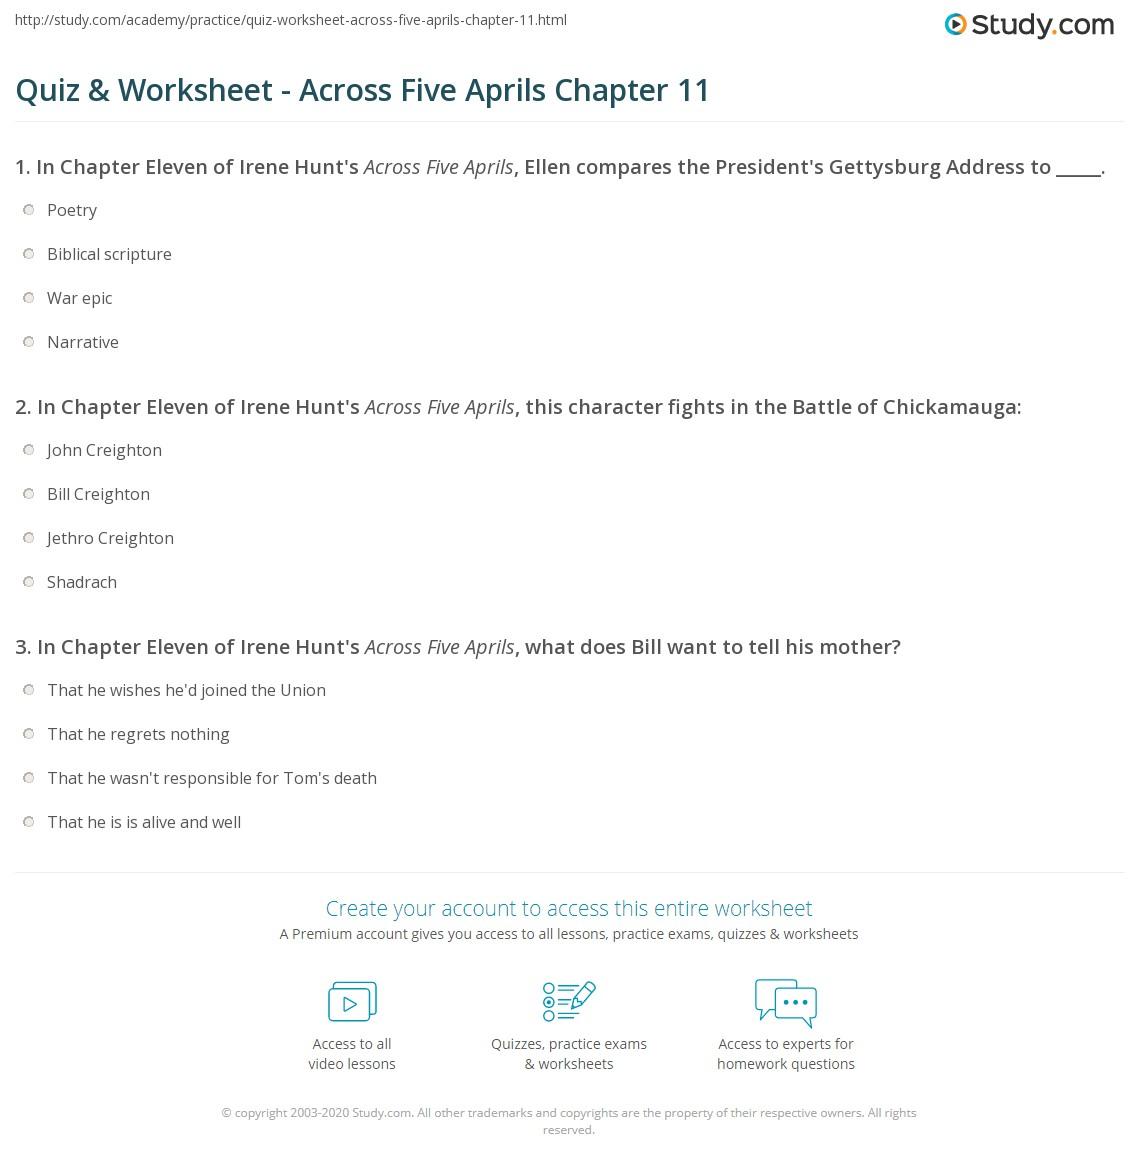 Worksheets Gettysburg Address Worksheet quiz worksheet across five aprils chapter 11 study com print summary worksheet